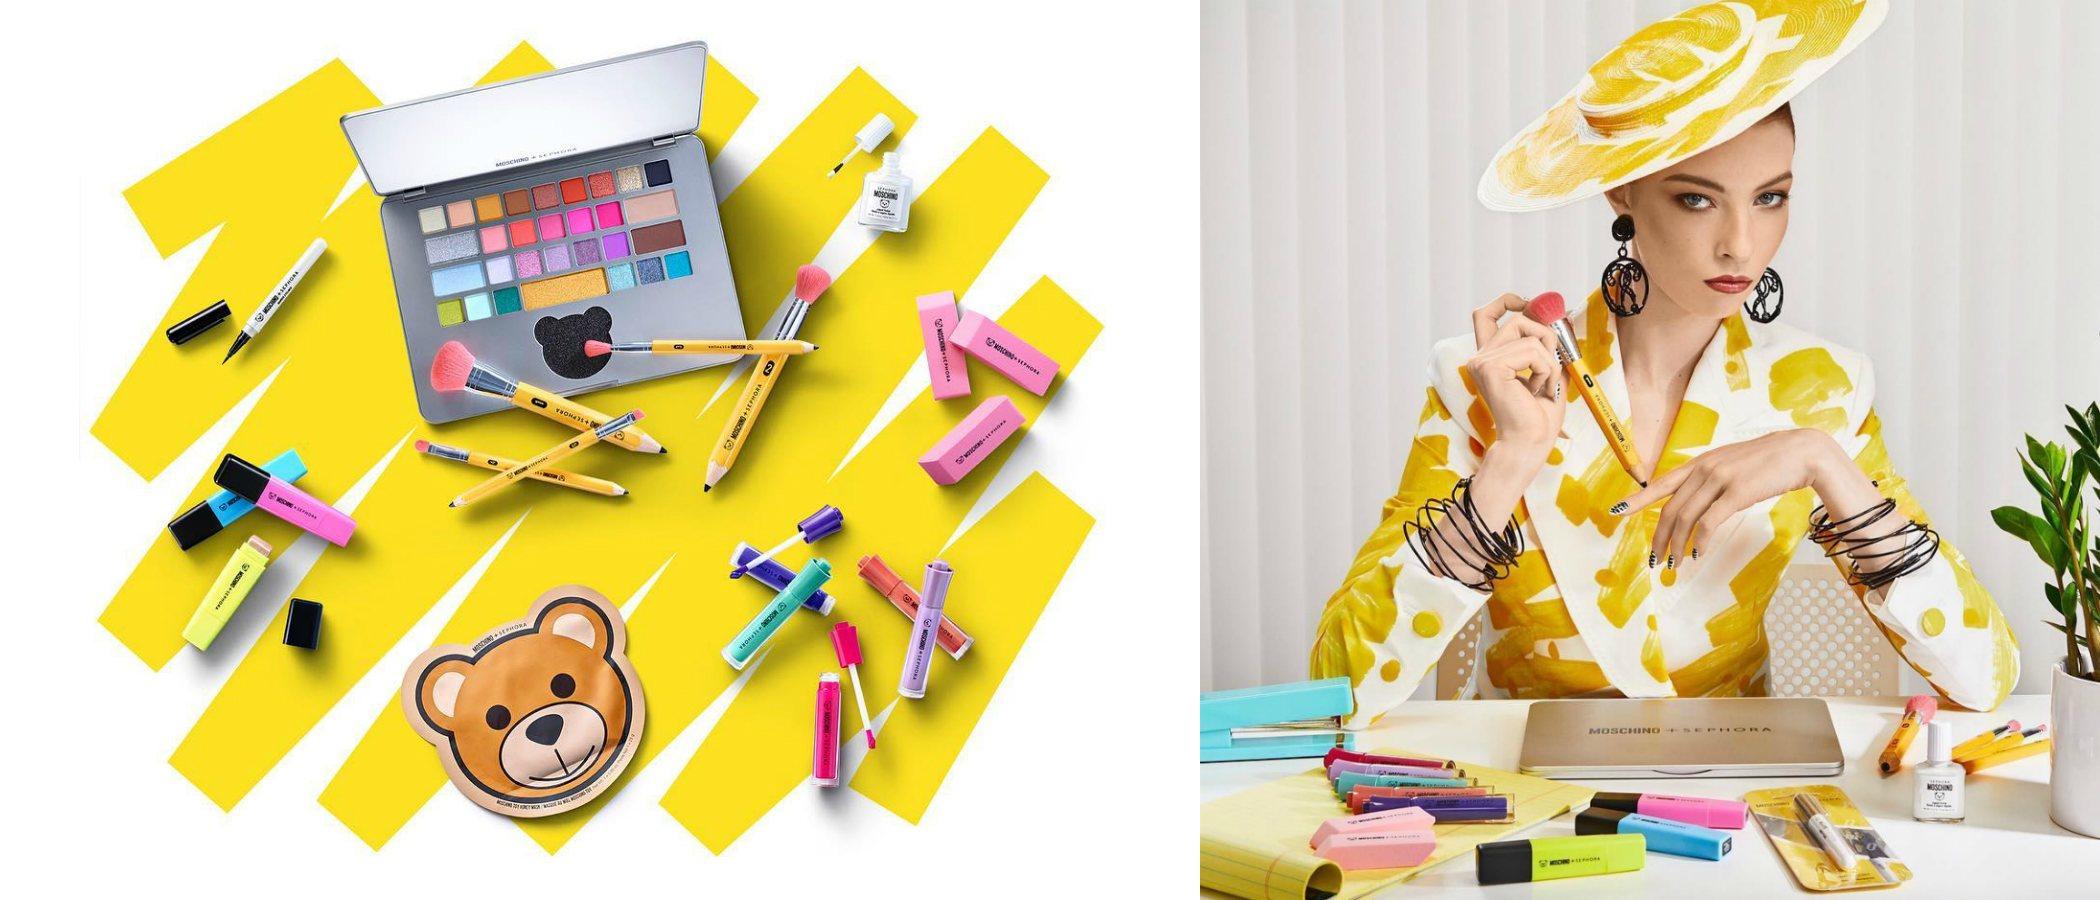 Moschino lanza una original colección inspirada en material de oficina en colaboración con Sephora